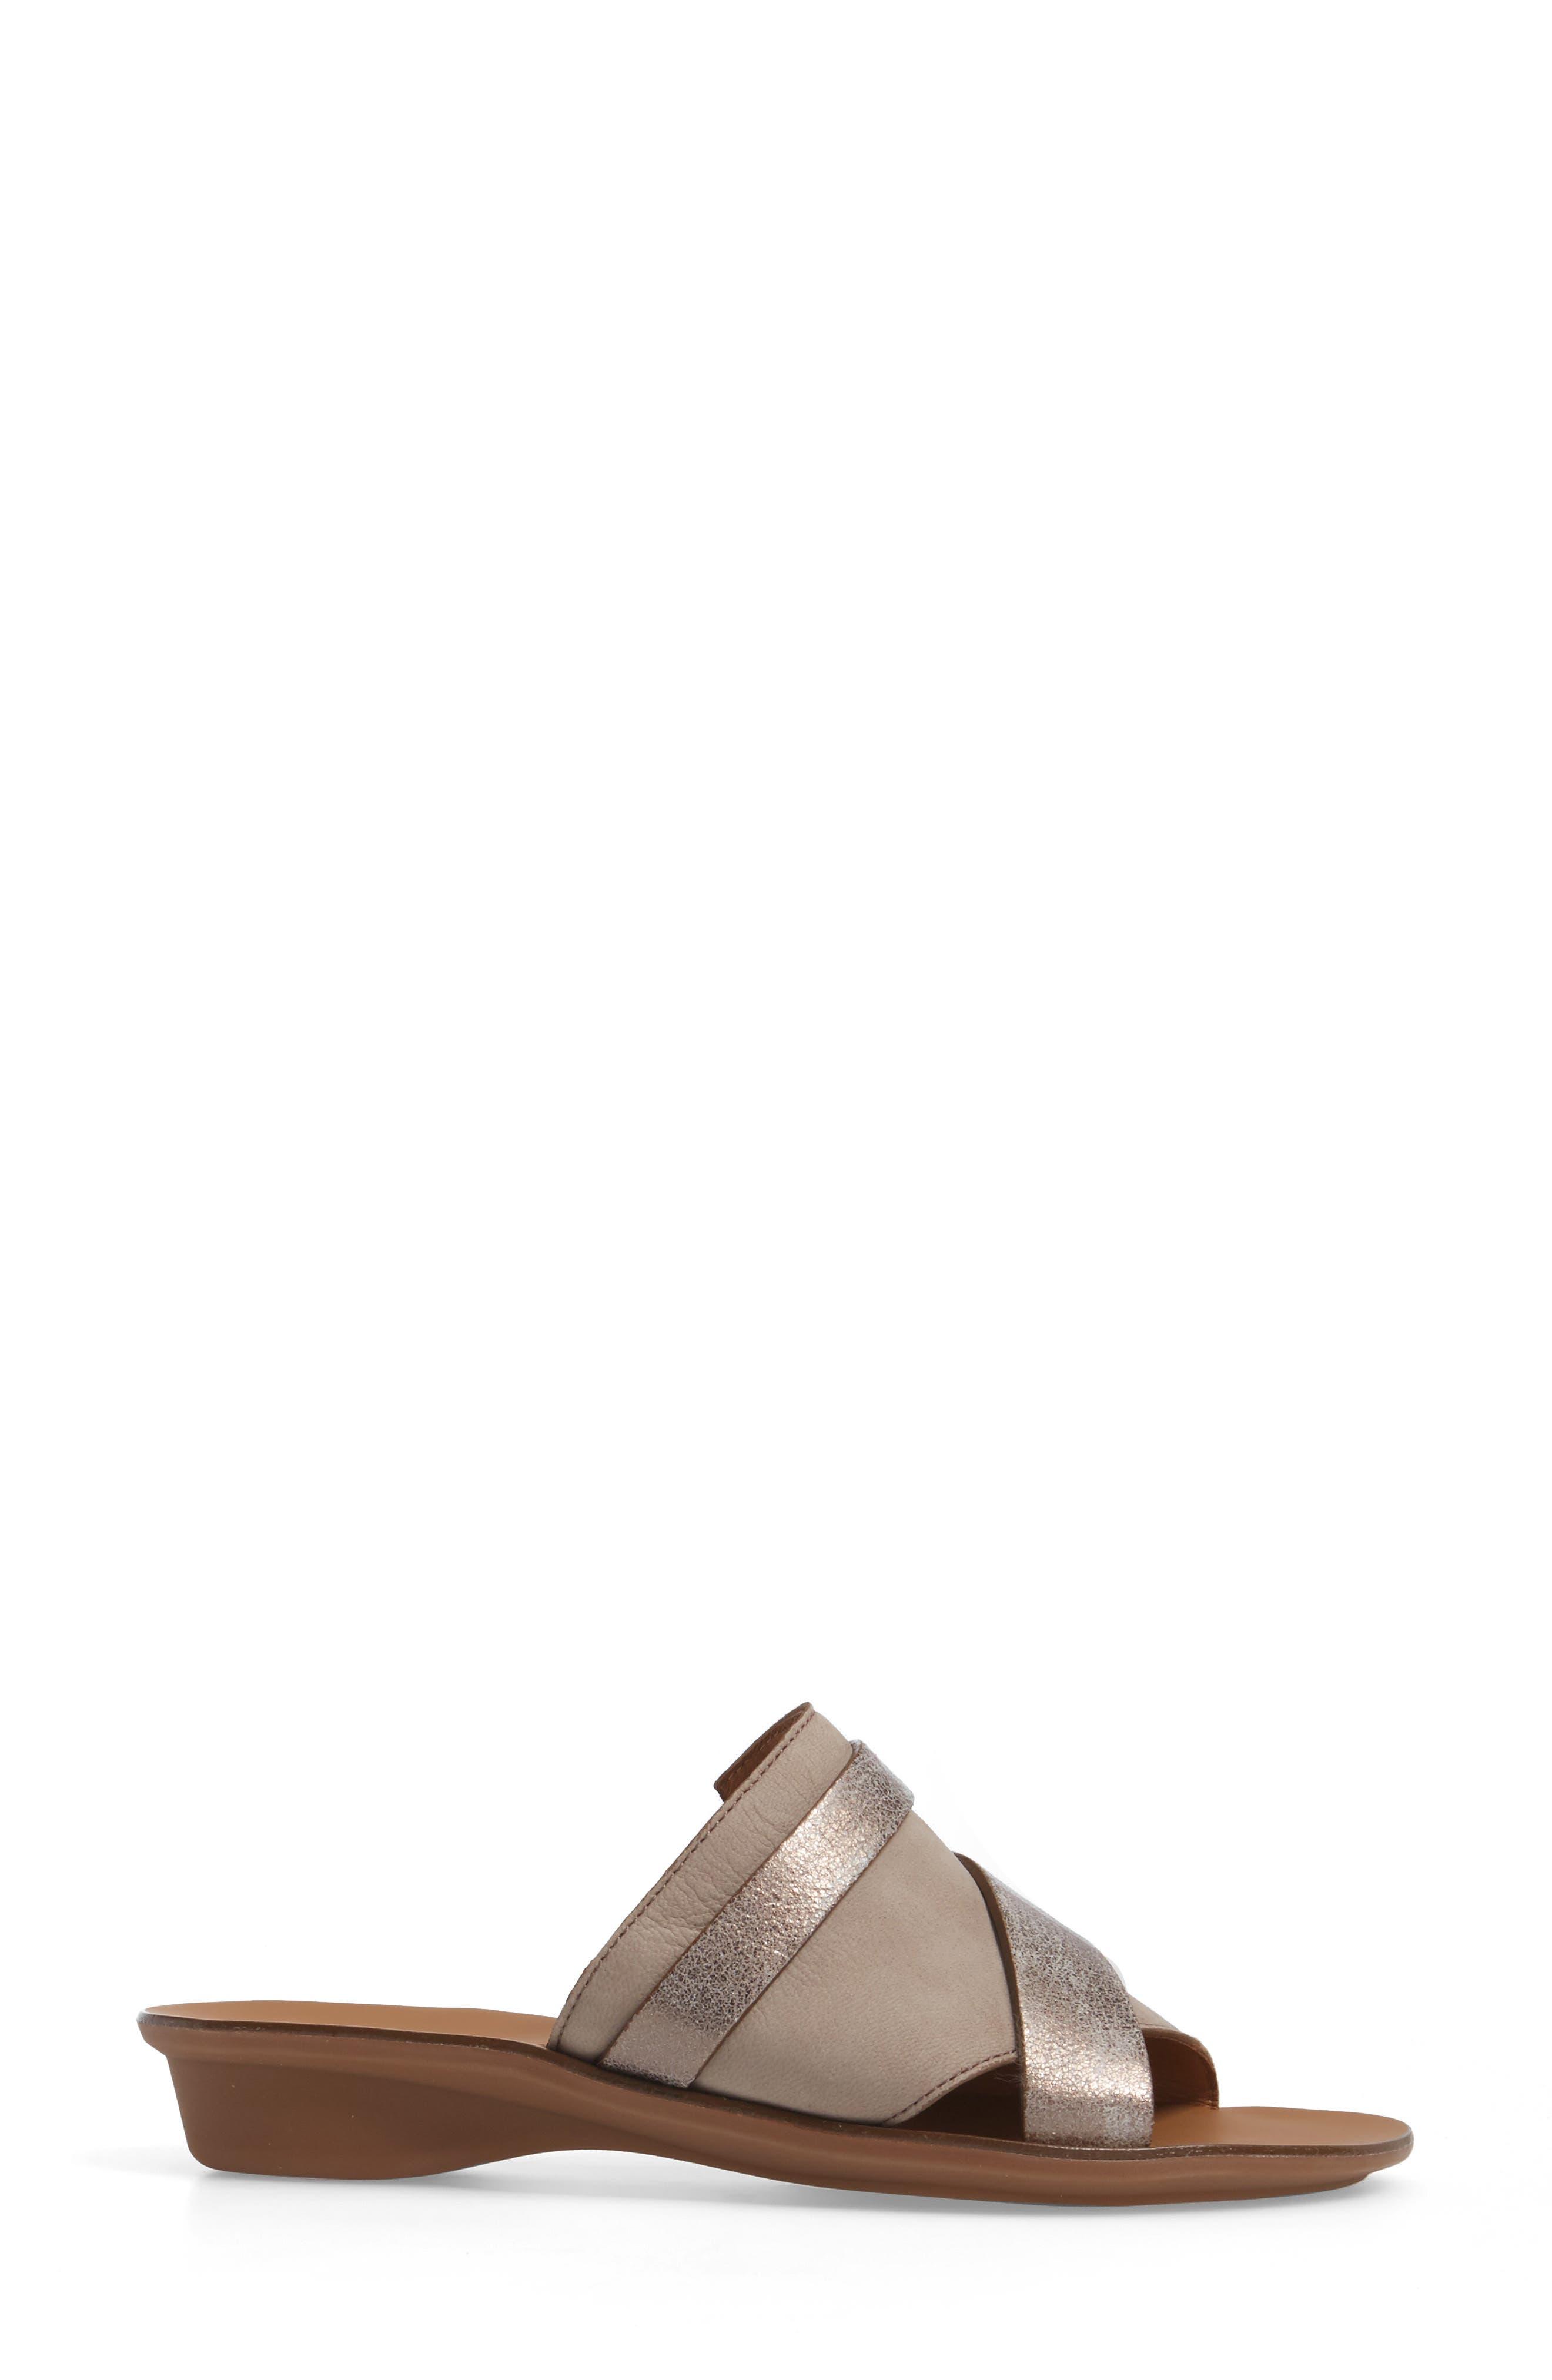 Alternate Image 3  - Paul Green 'Bayside' Leather Sandal (Women)